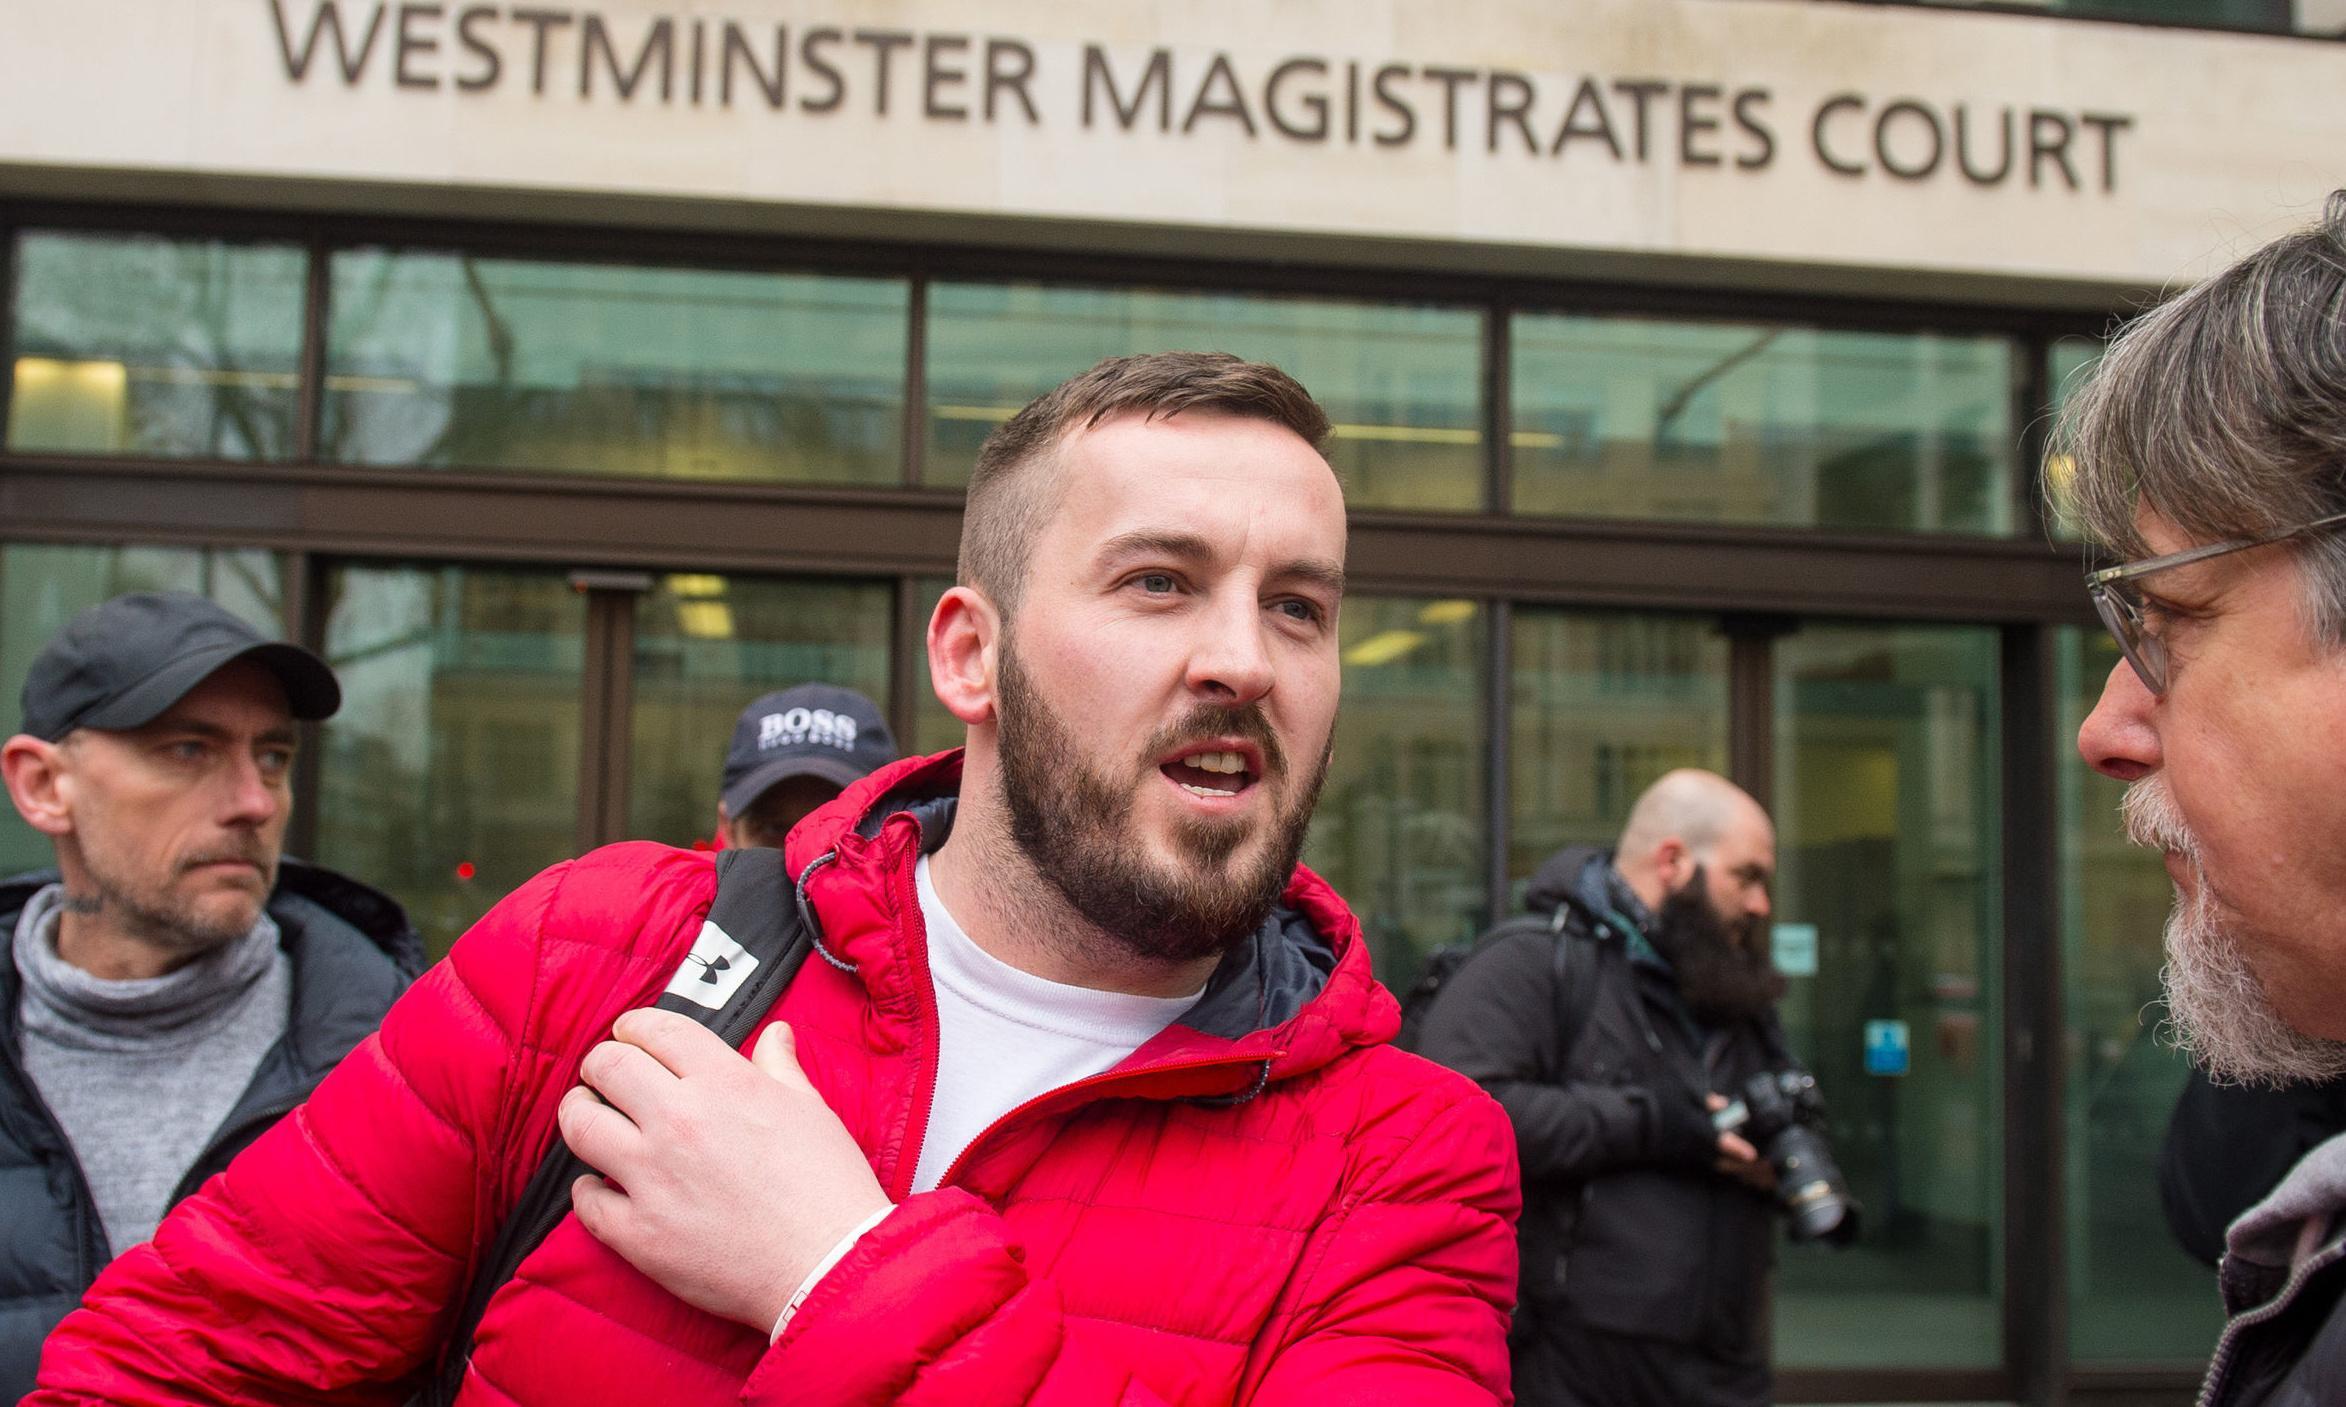 Pro-Brexit activist James Goddard denies harassing Anna Soubry